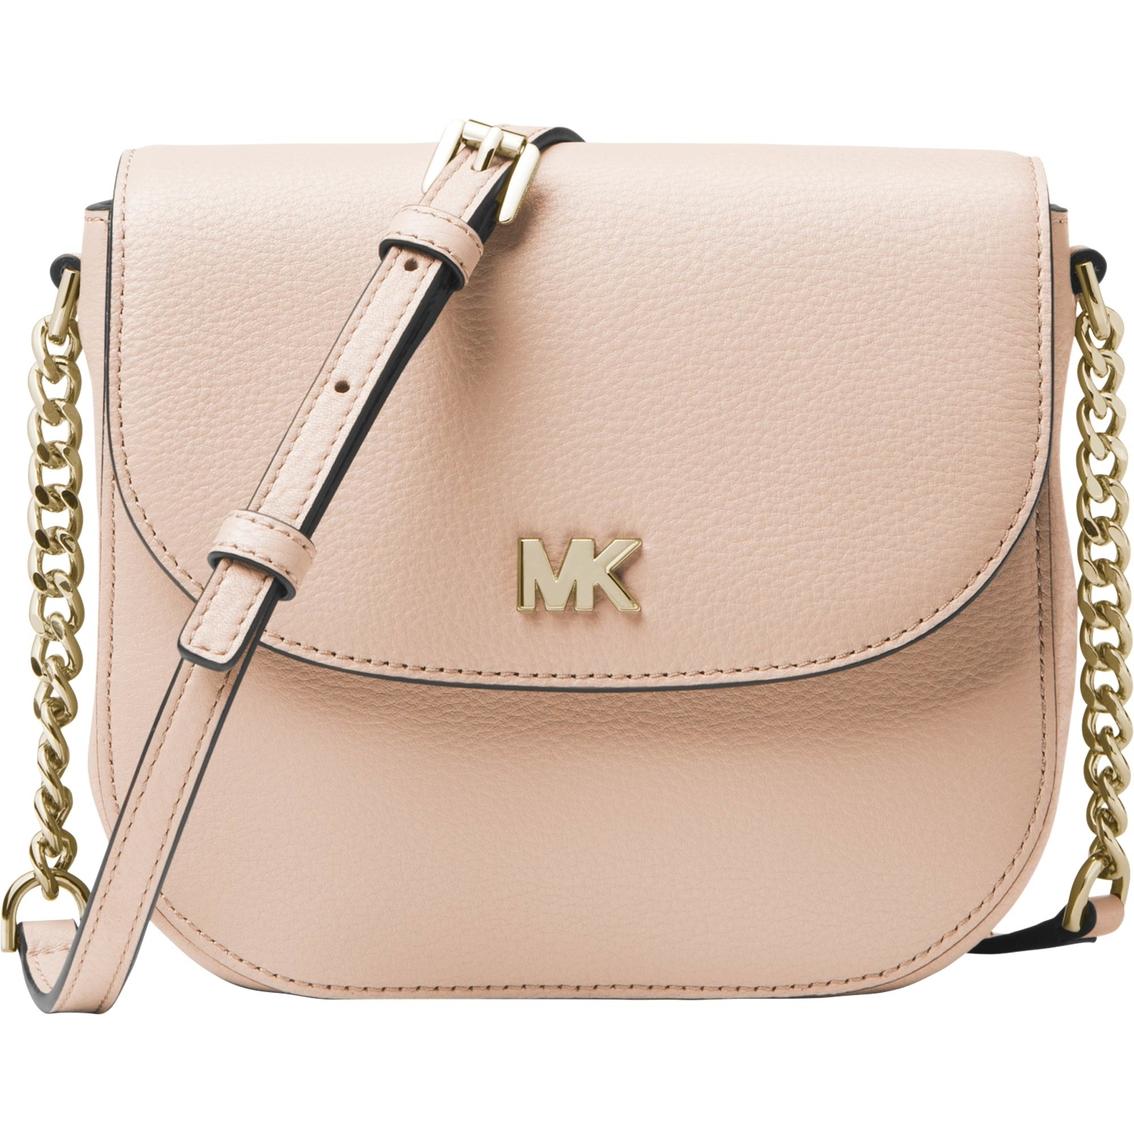 a1651003cb59a5 Michael Kors Women's Half Dome Crossbody Soft Pink | Handbags | Shop ...